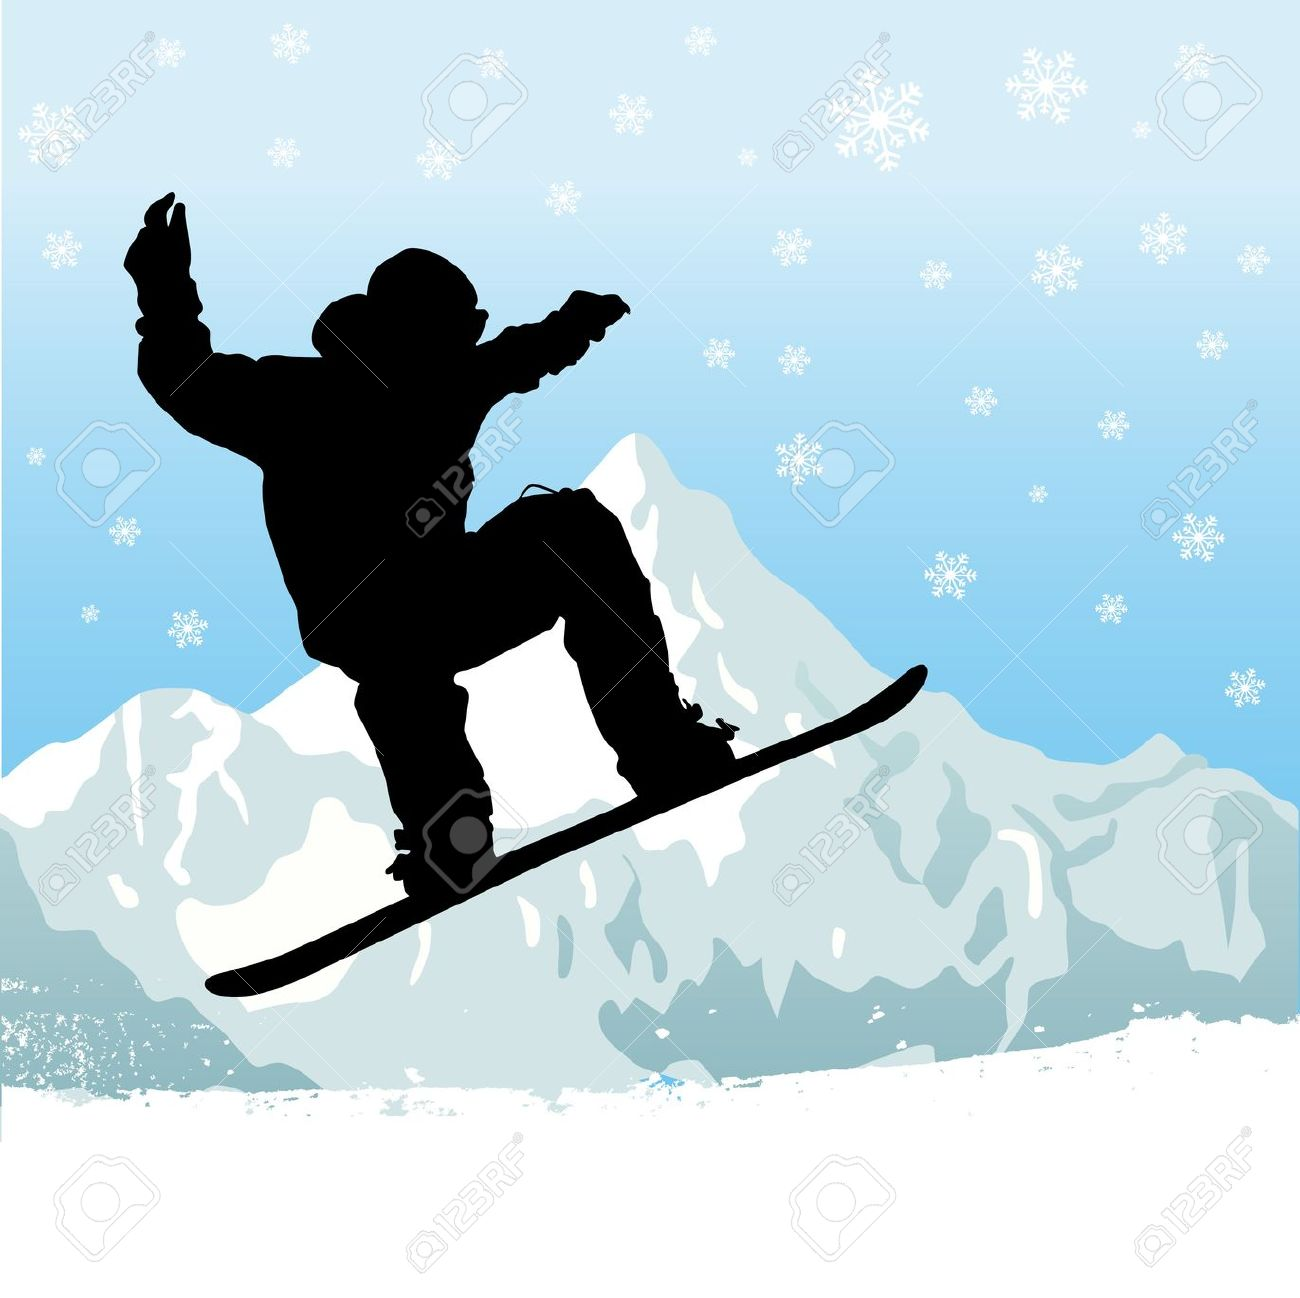 Snowboard Clipart #26.